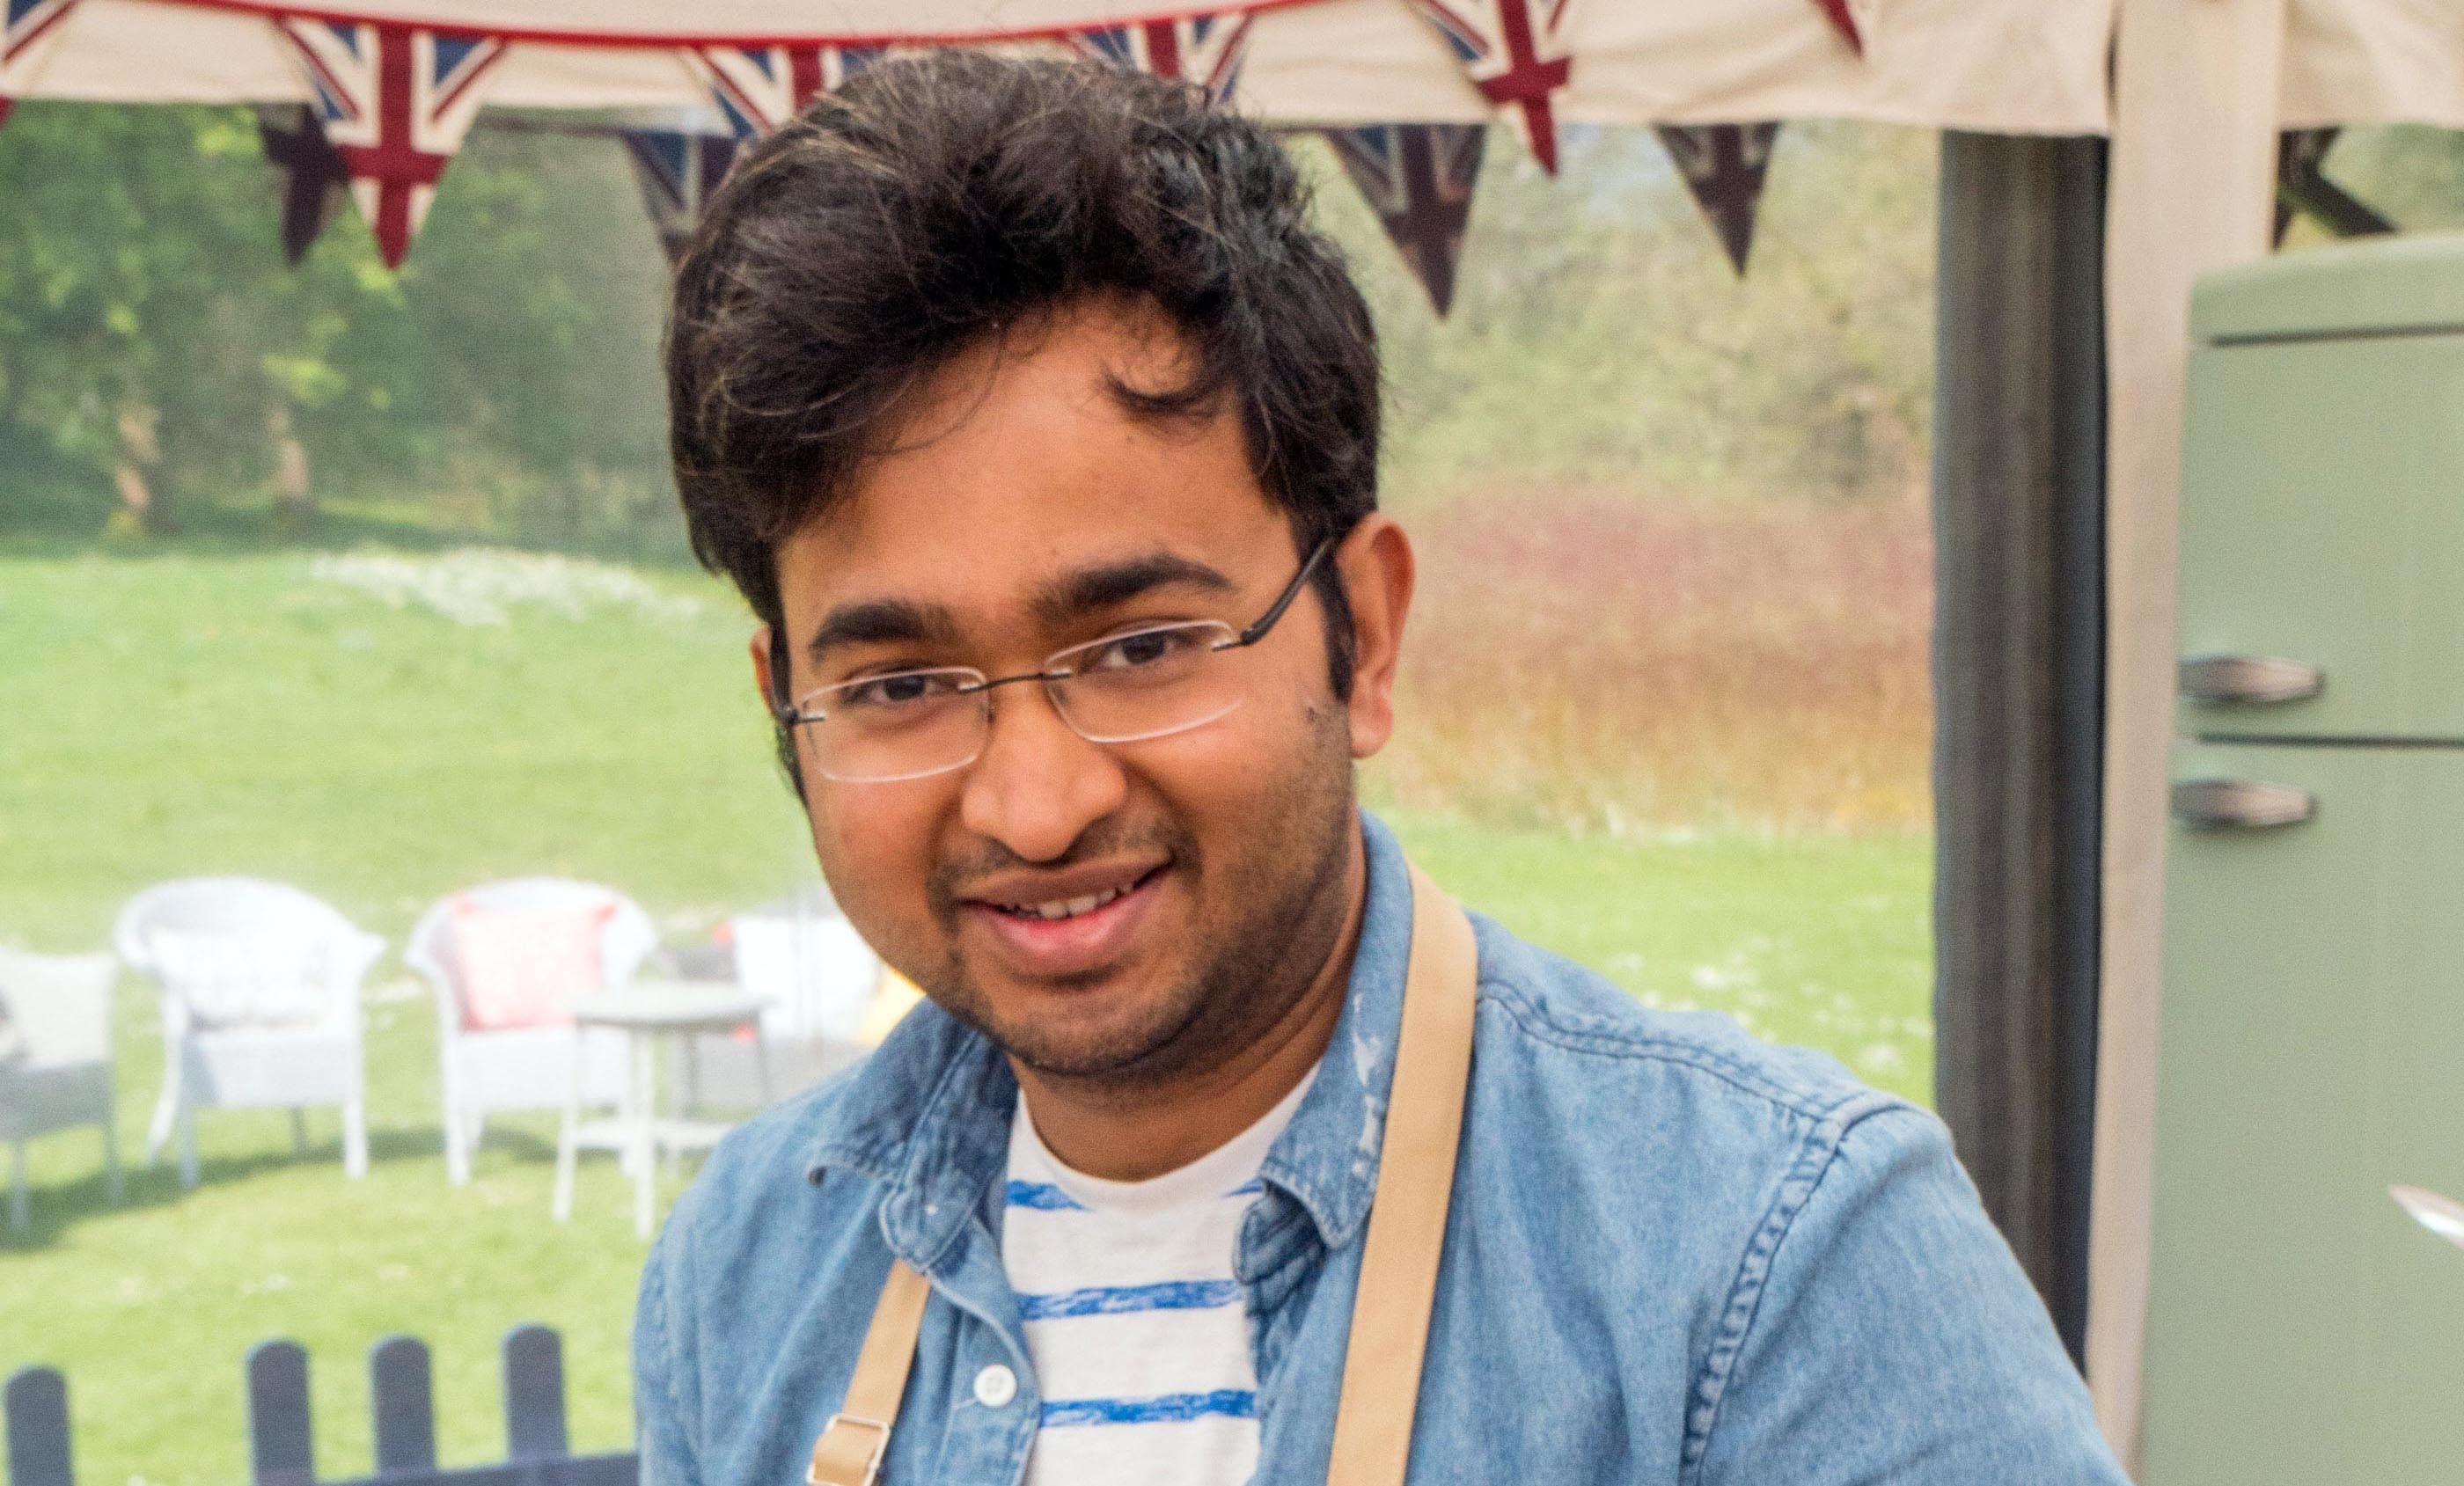 The Great British Bake Off 2018 - Rahul